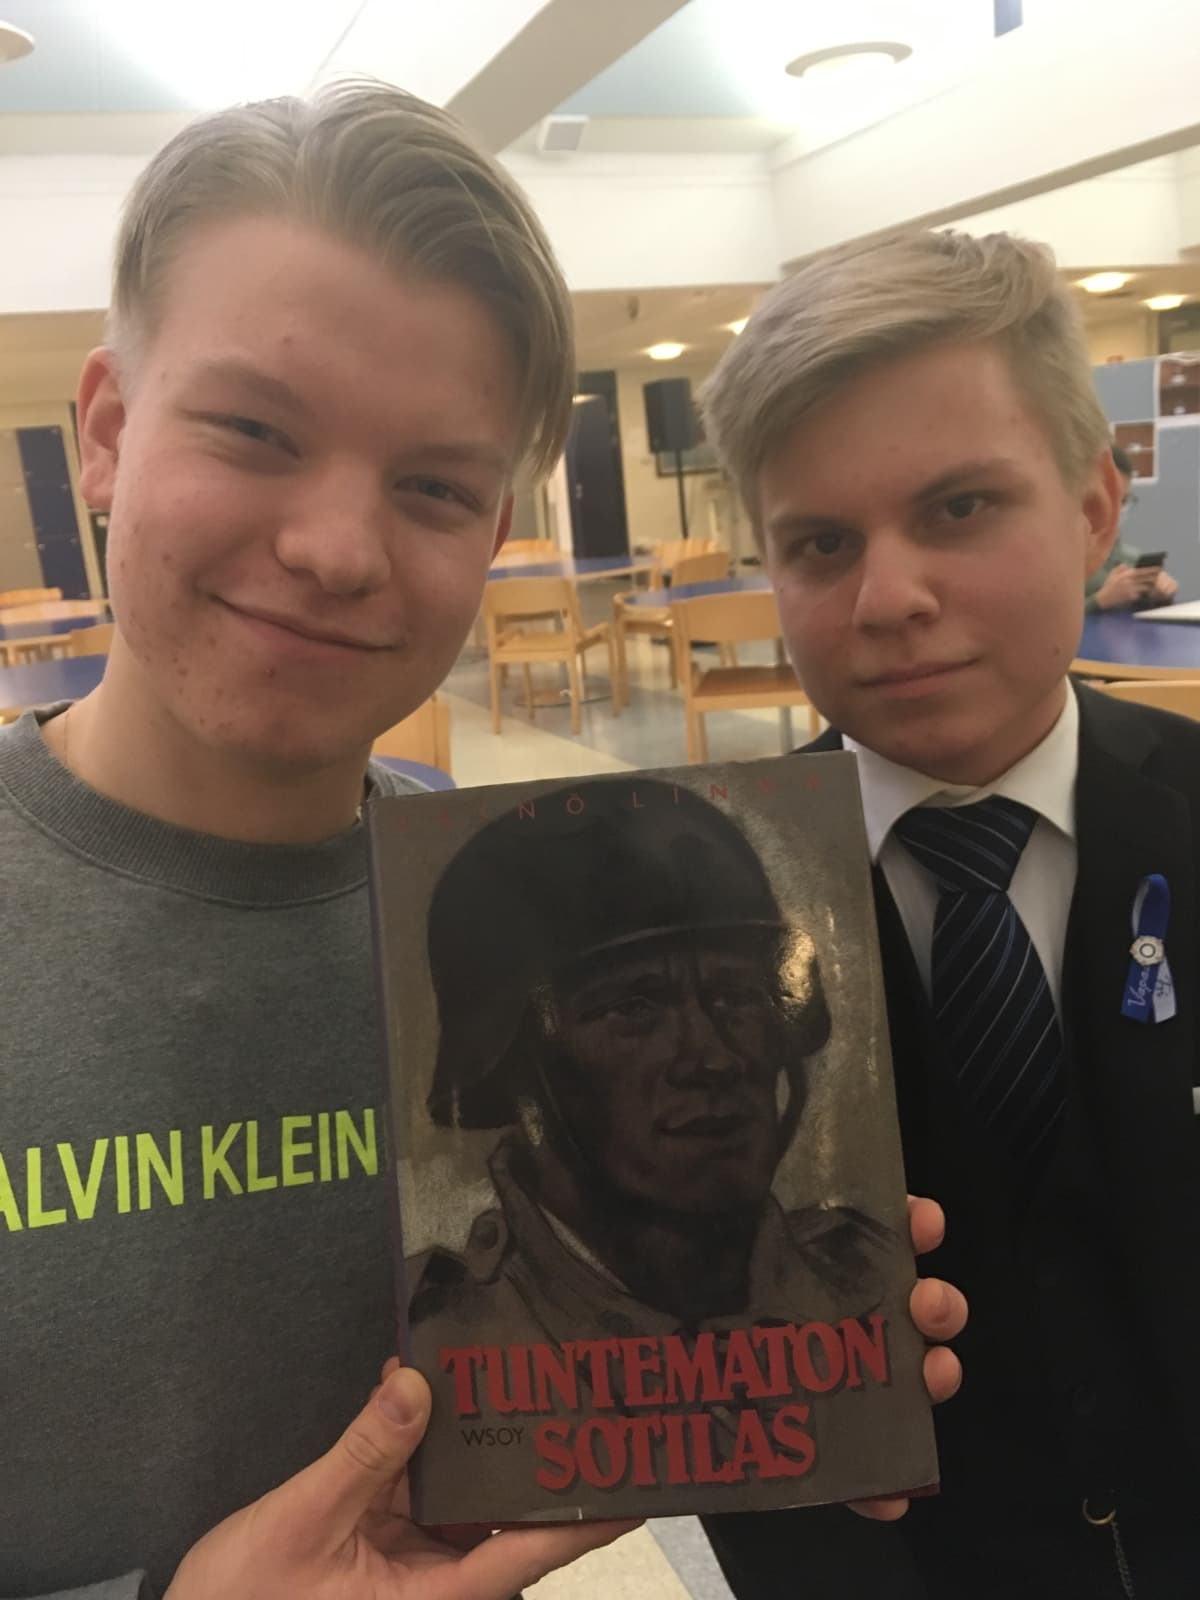 Eemil Mäkimattila ja Arttu Kinnunen